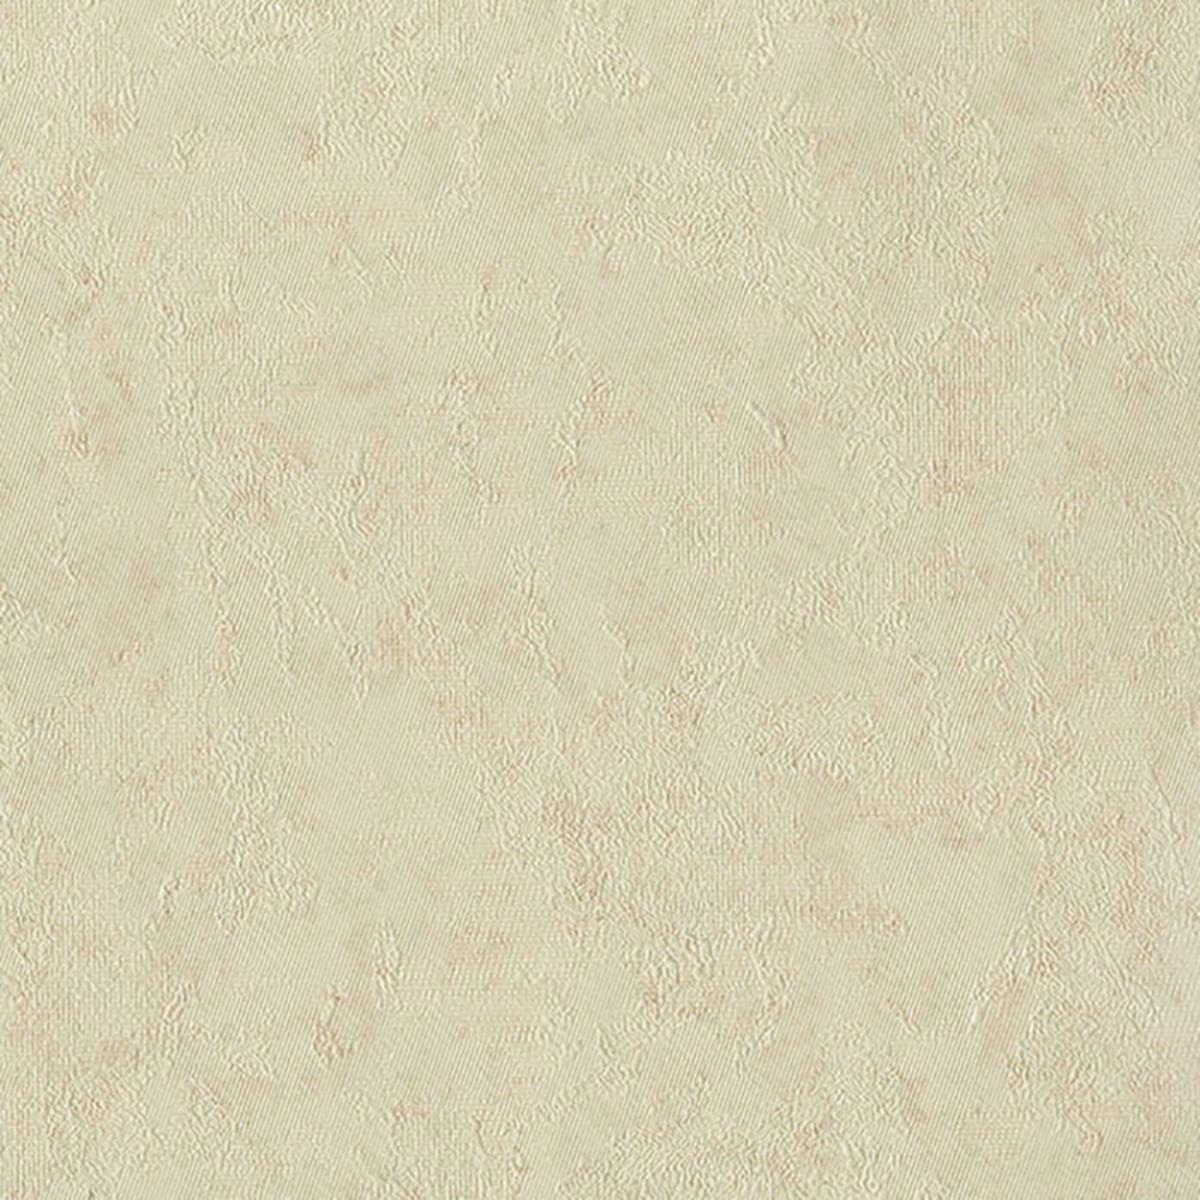 Обои виниловые Shinhan Wallcoverings бежевые 1.06 м 88279-3